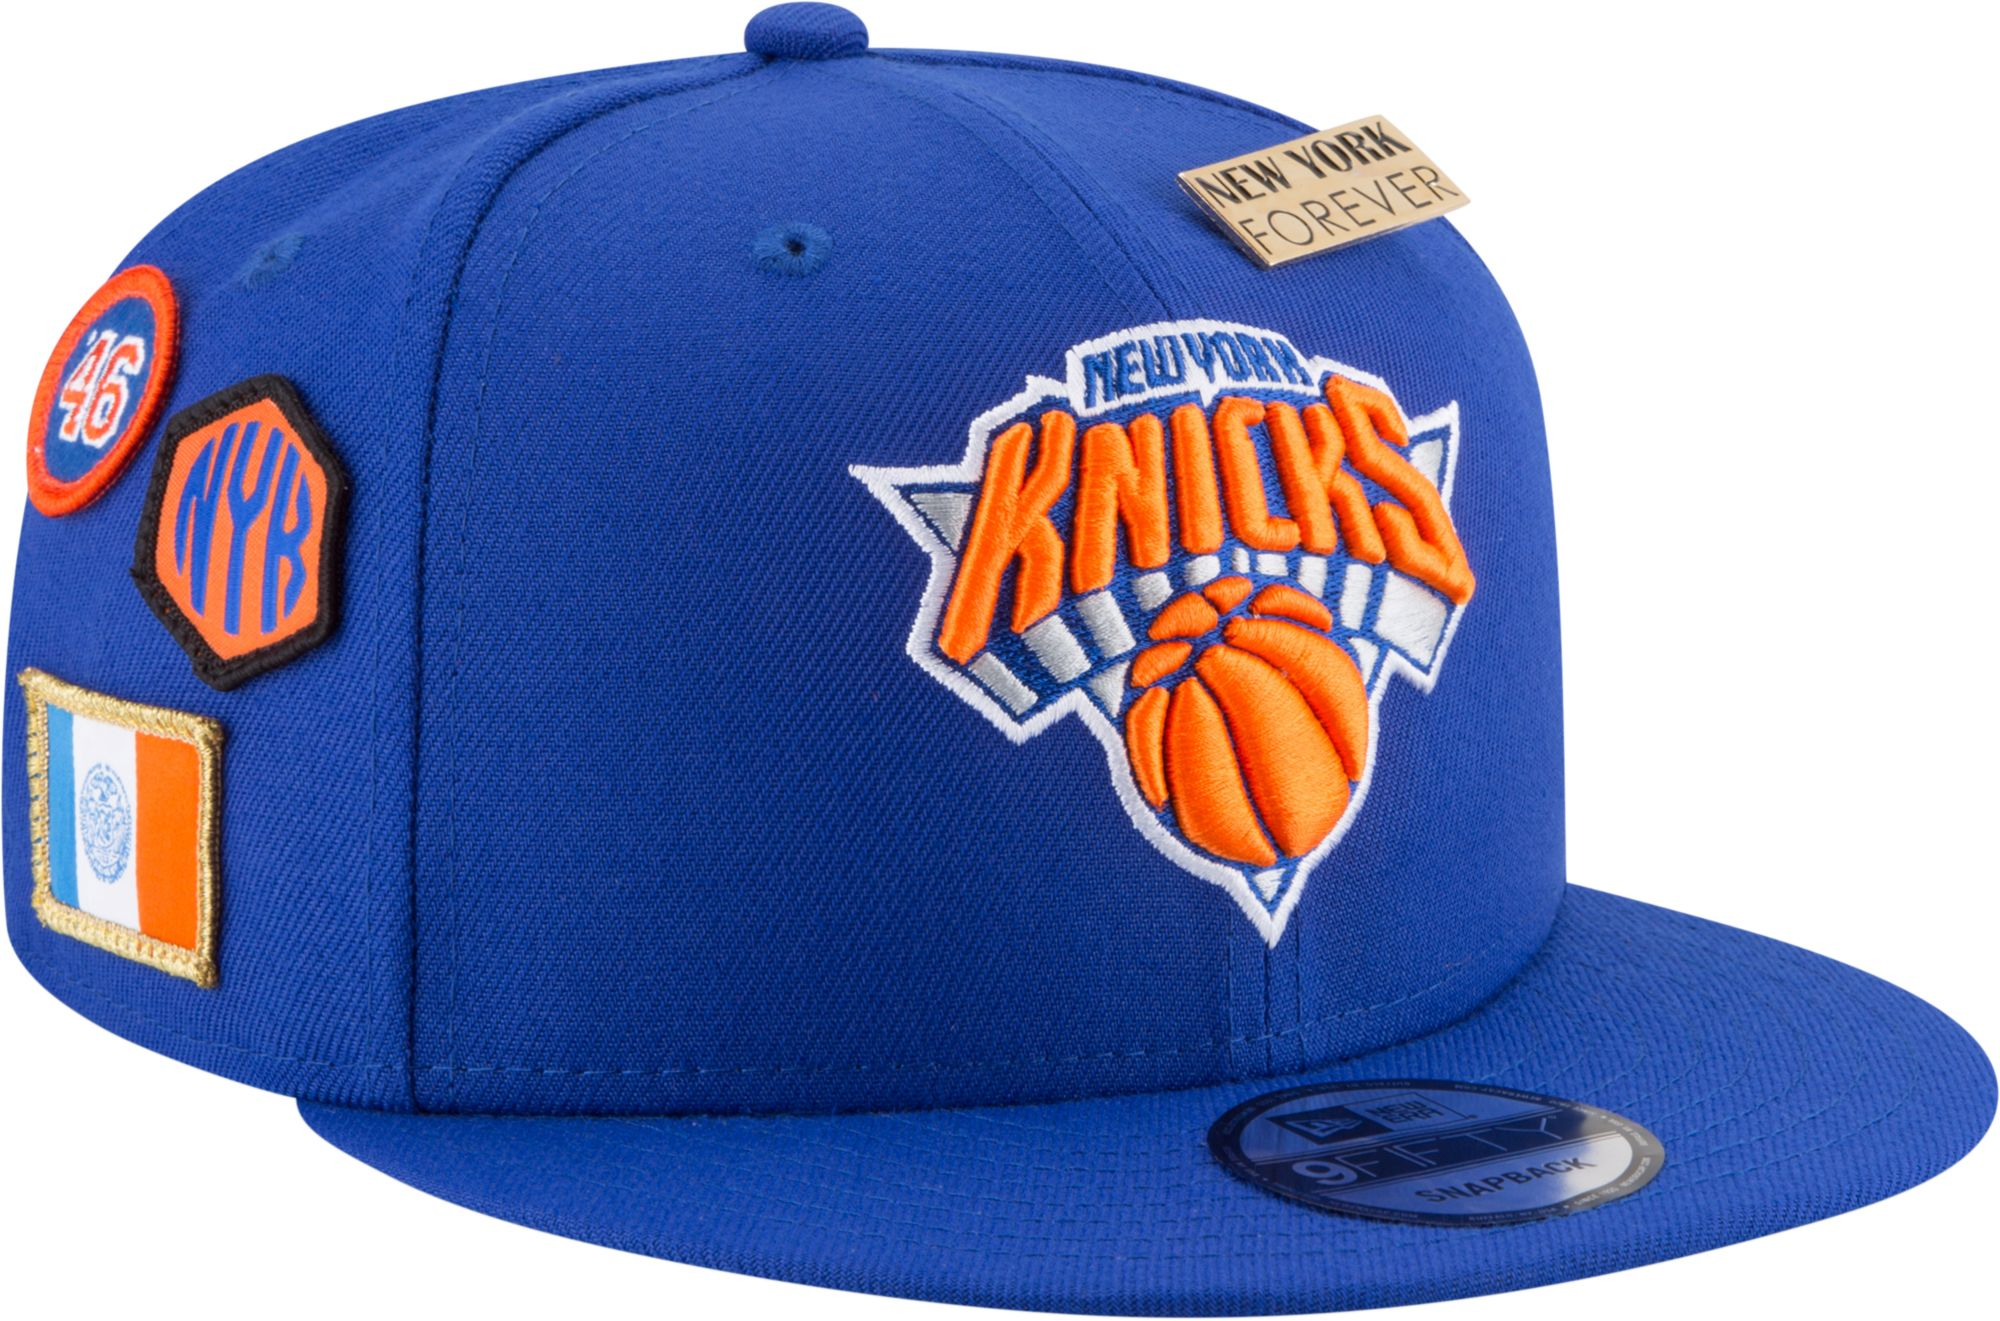 newest 8bc05 c0ec4 New Era Men s New York Knicks 2018 NBA Draft 9Fifty Adjustable Snapback Hat,  Team